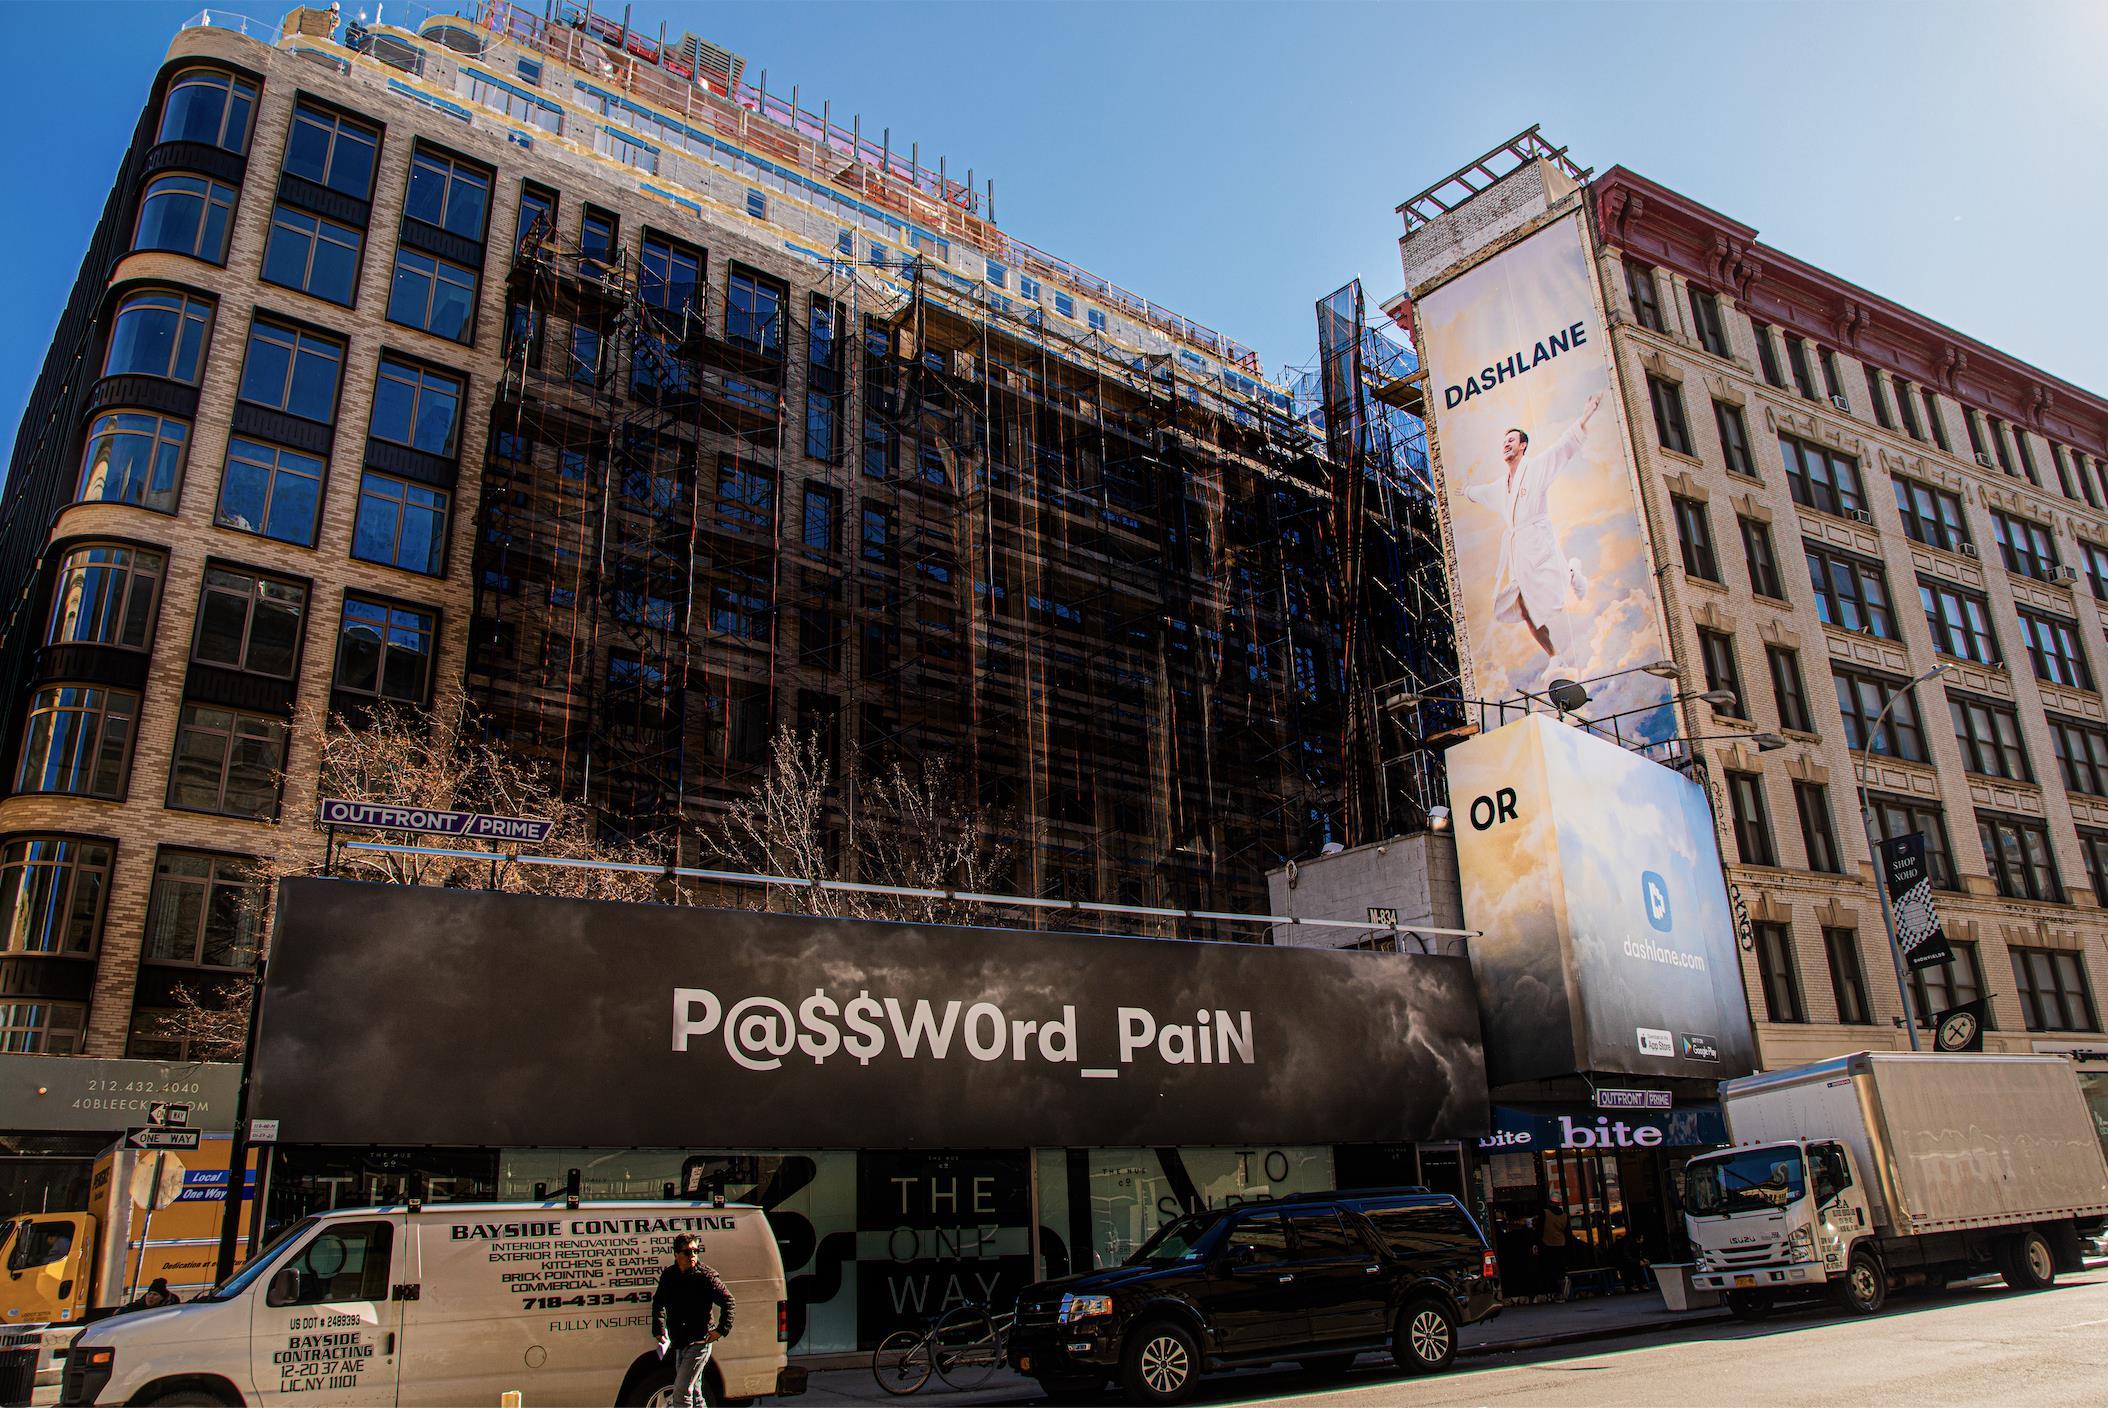 Password Pain